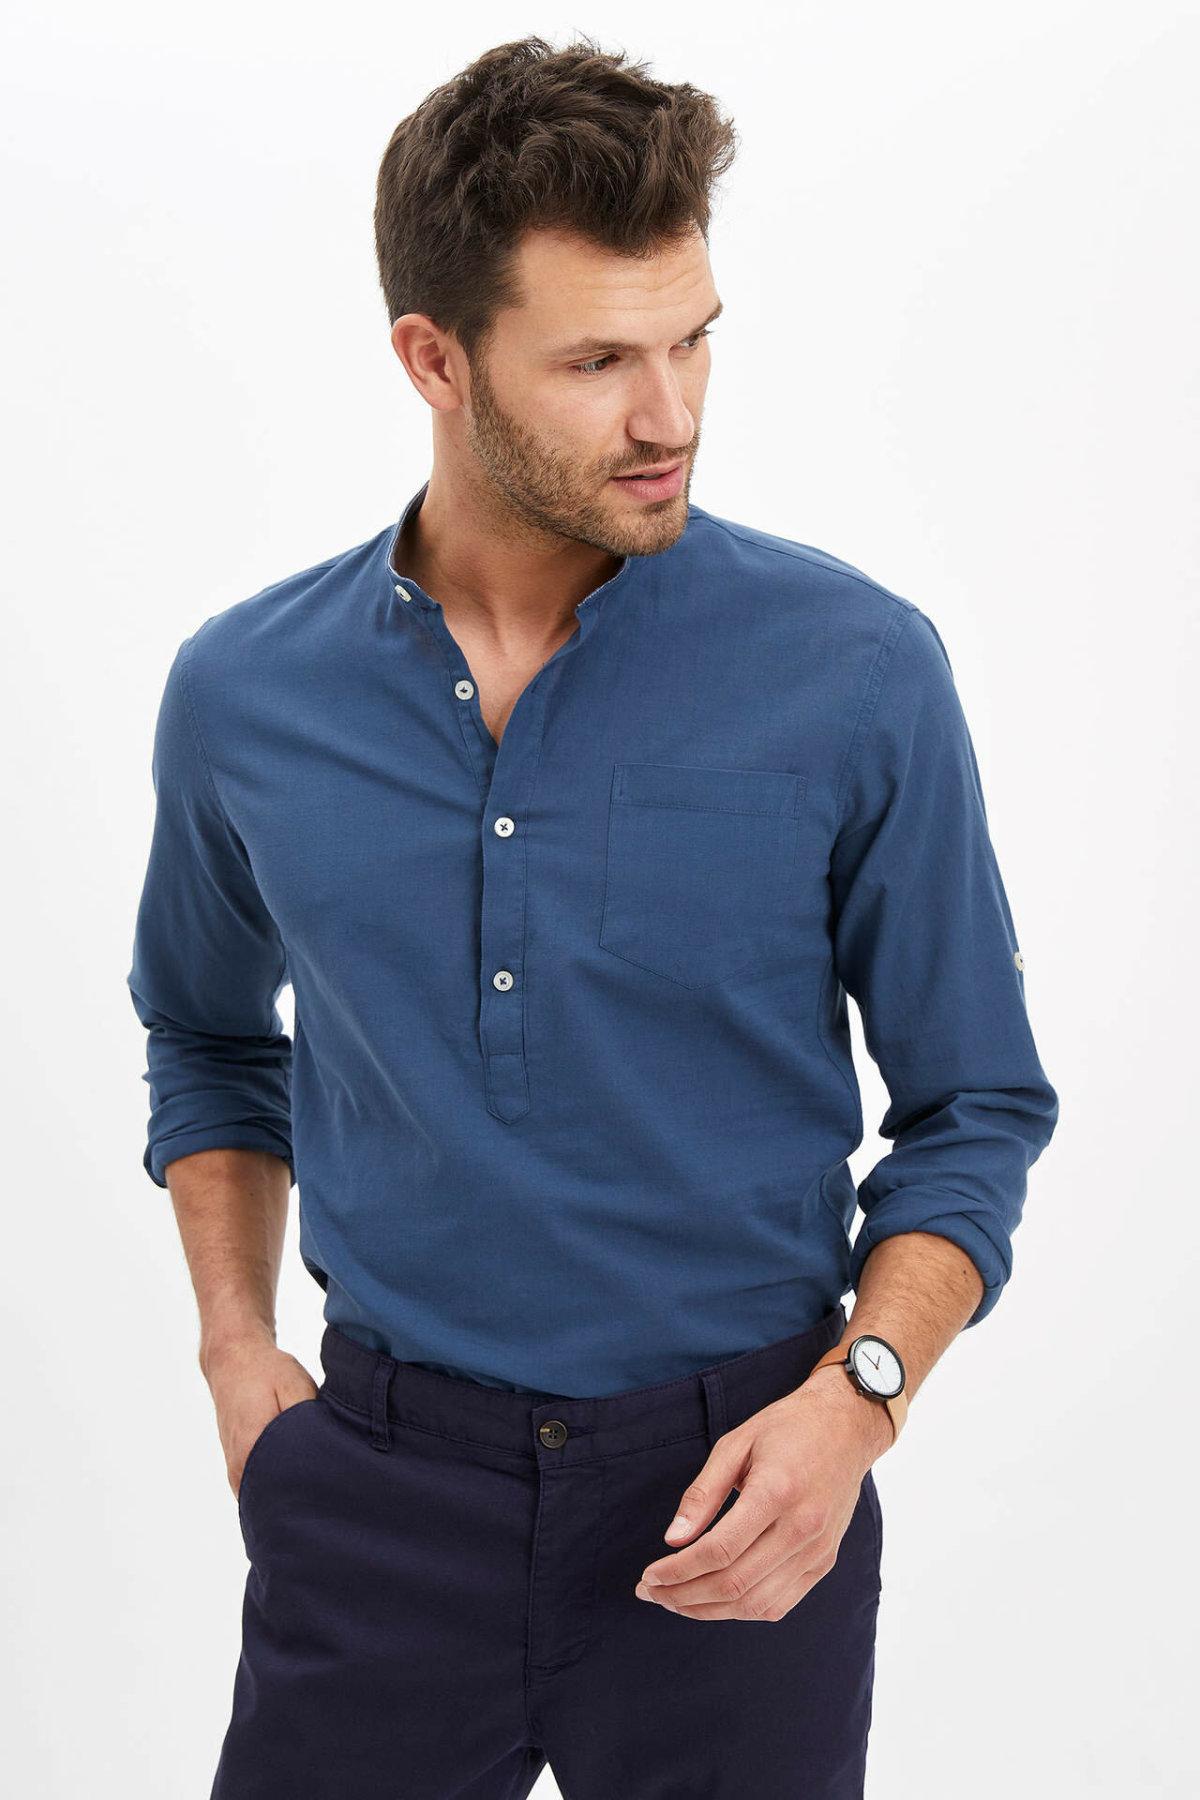 DeFacto Man Long Sleeve Shirt Men Smart Casual Shirts Summer Solid Color Shirts For Men White Shirts Men's Shirt-M9434AZ20SM